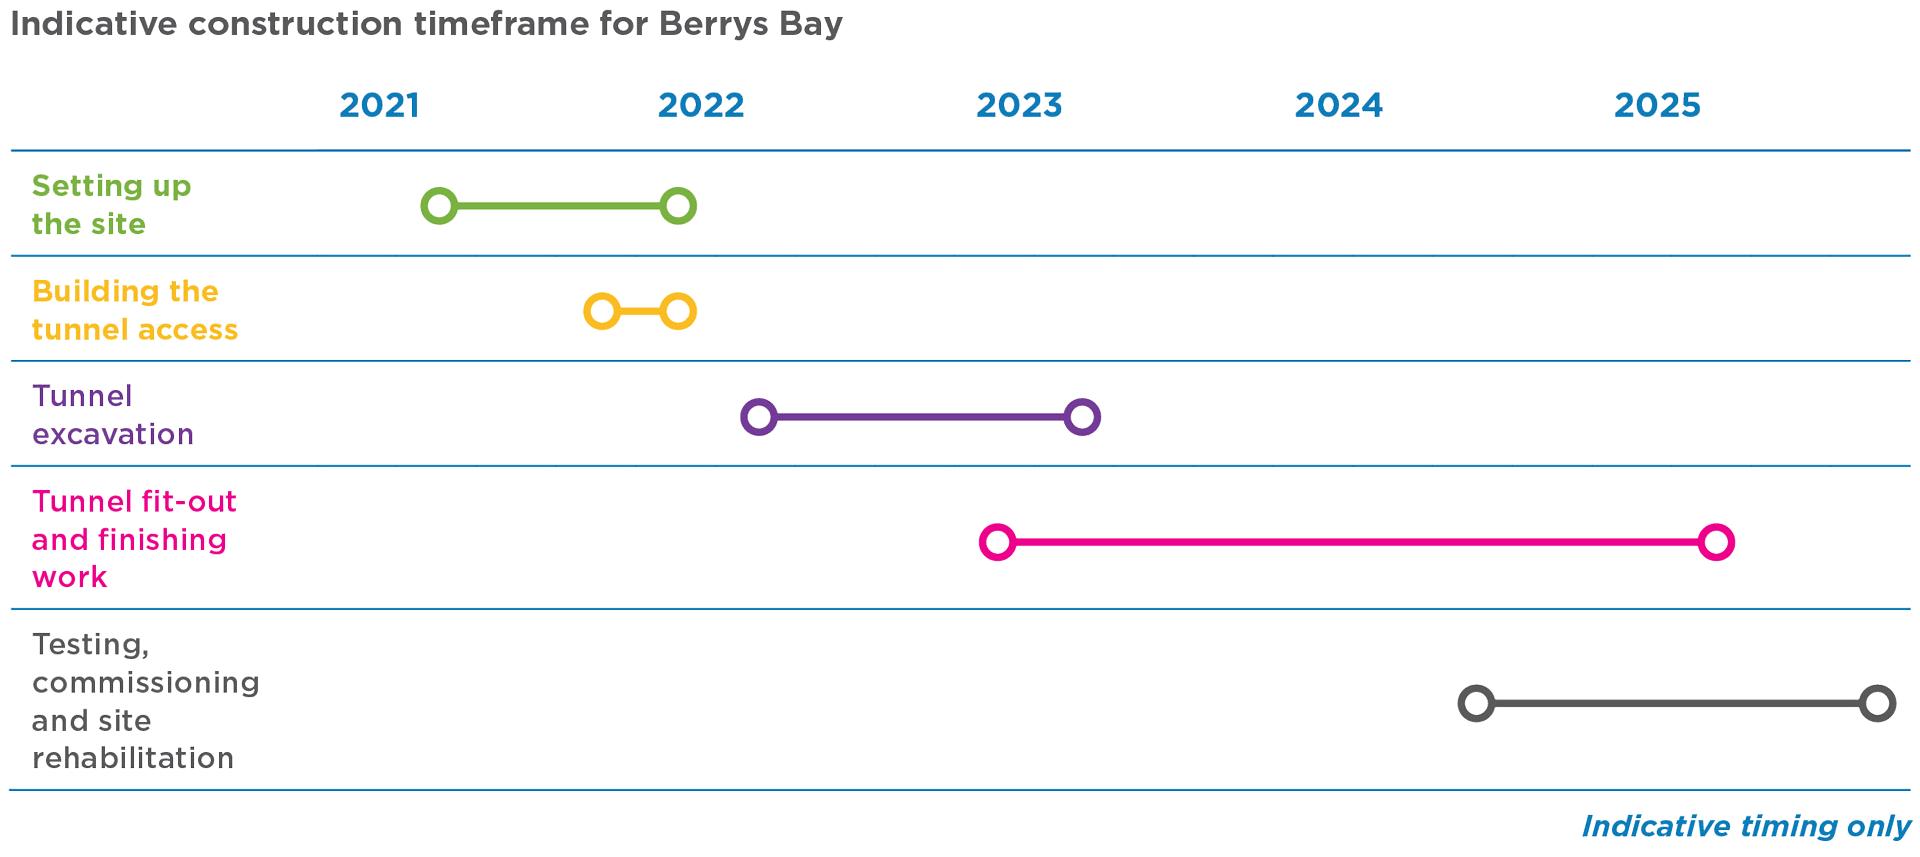 Berrys Bay construction site timeline